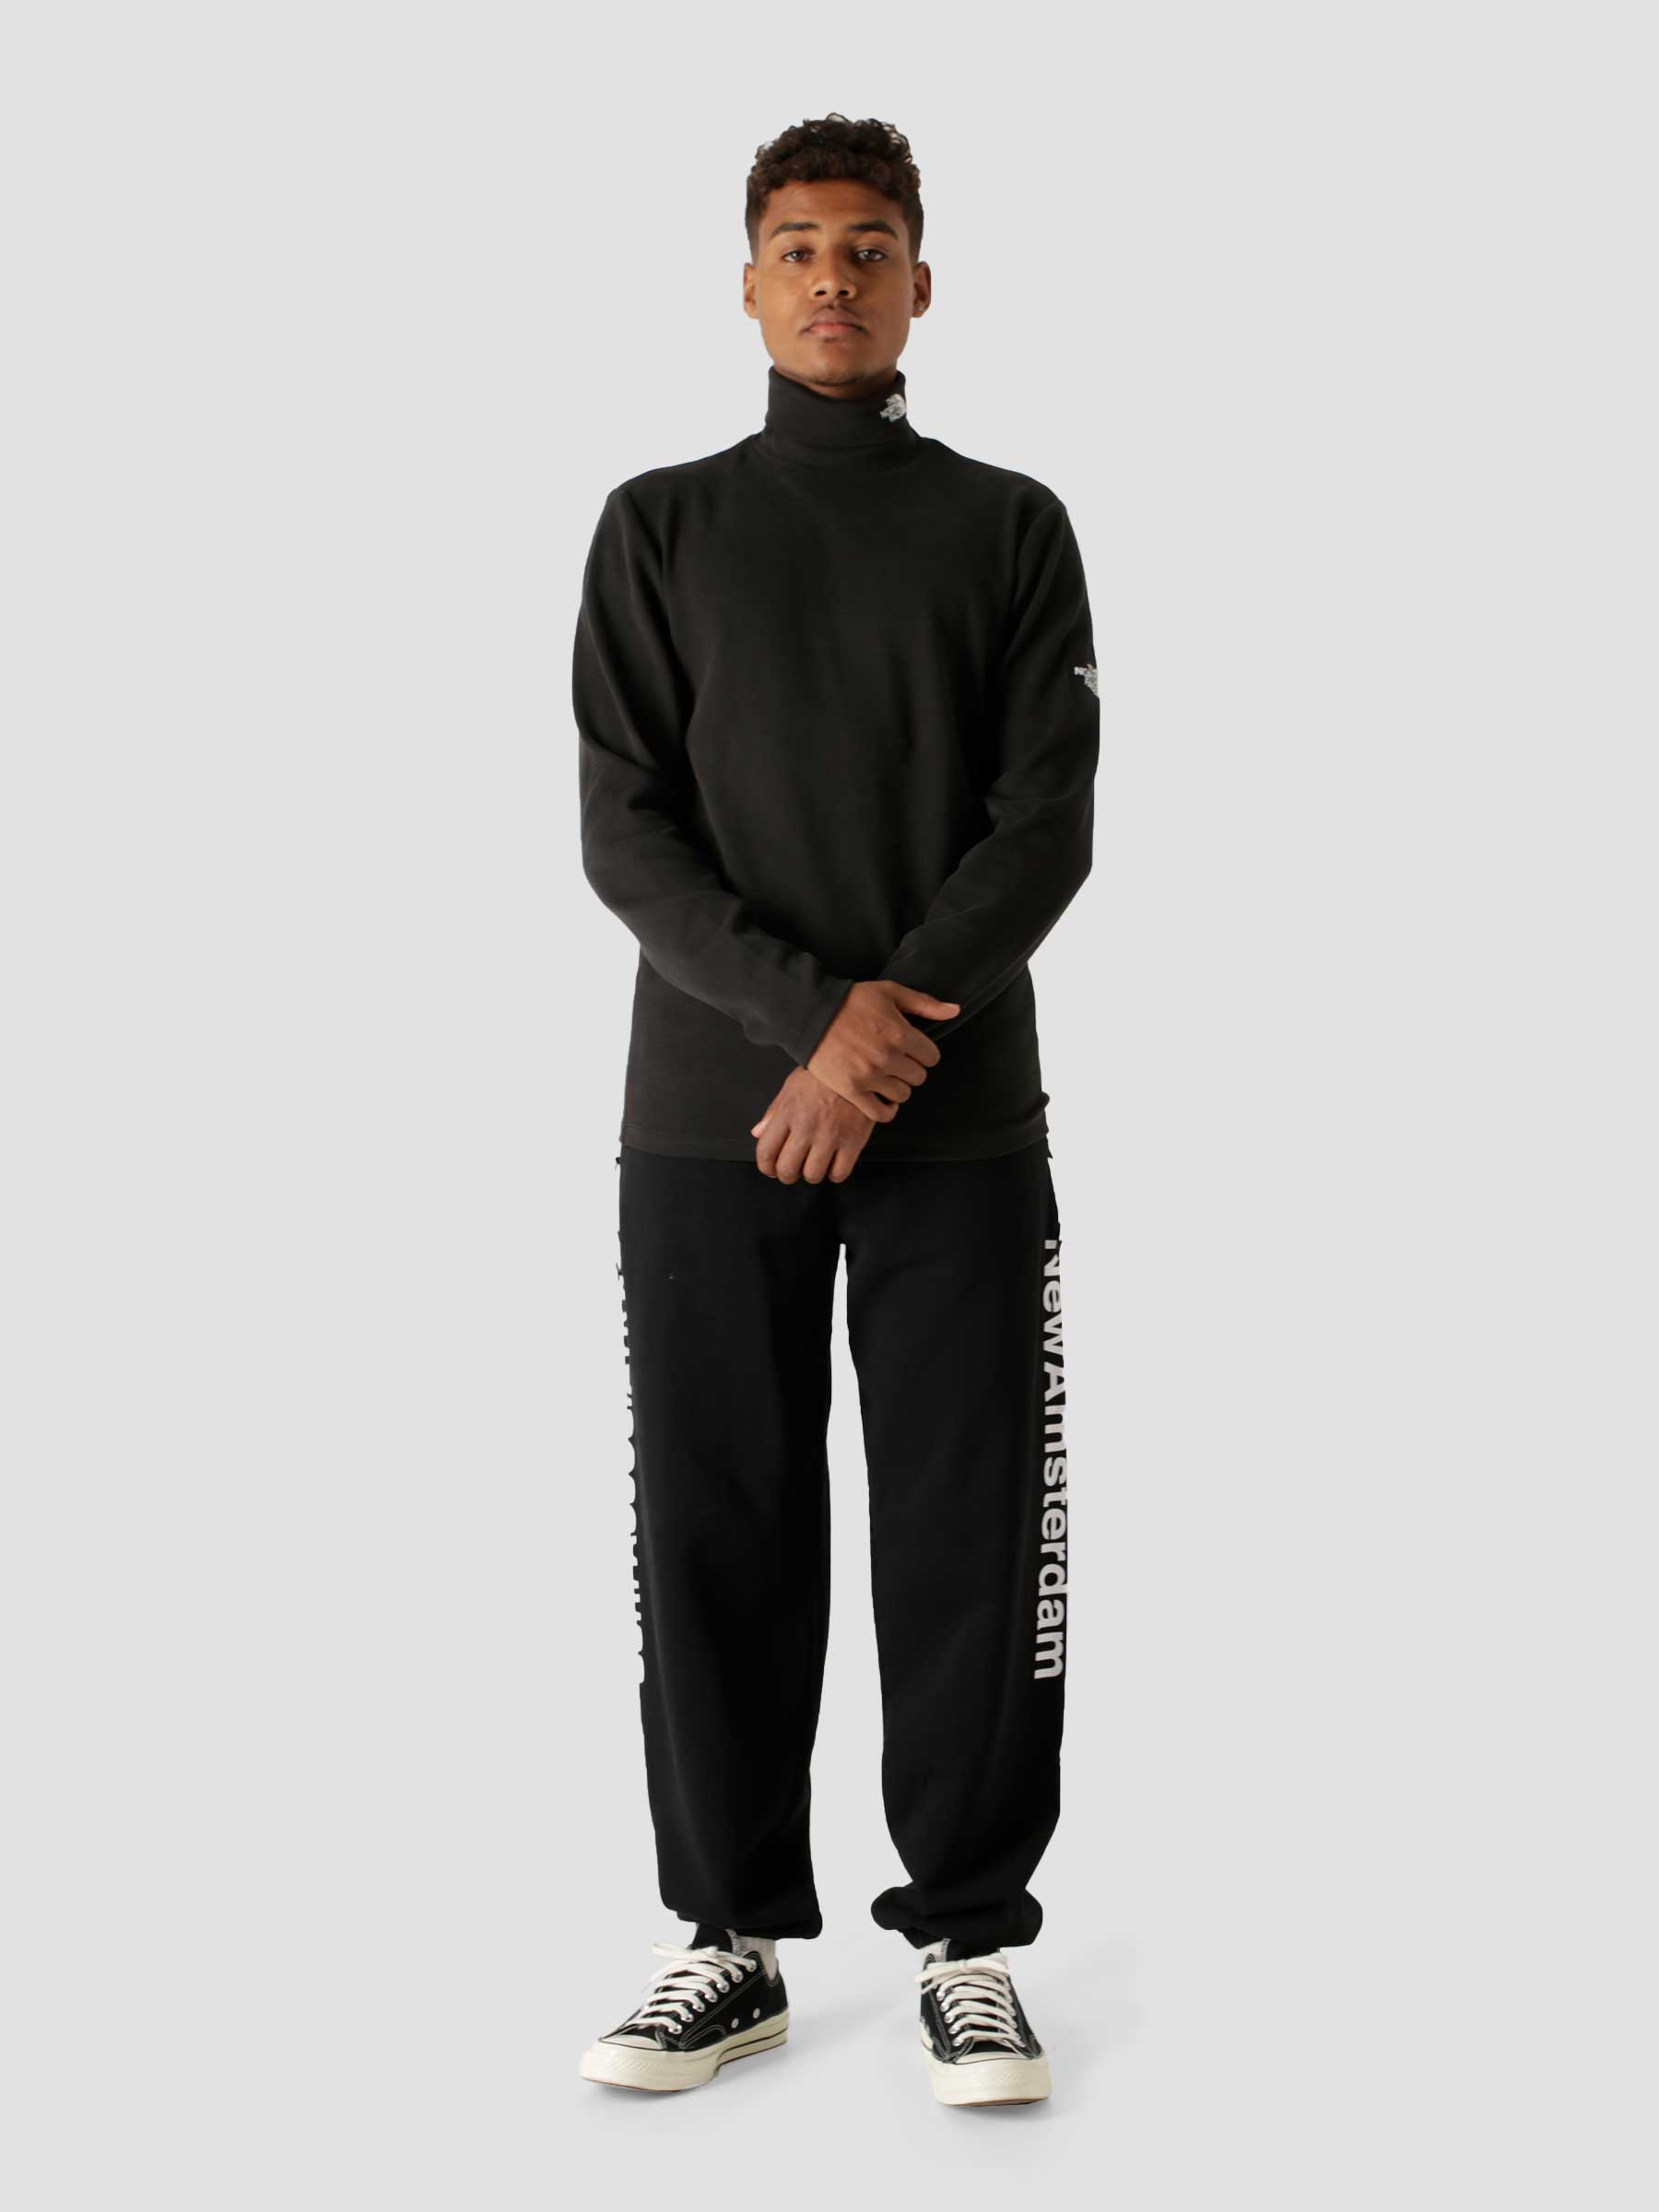 Bb Longsleevet Dnc Longsleeve T-Shirt TNF Black NF0A5ICAJK3